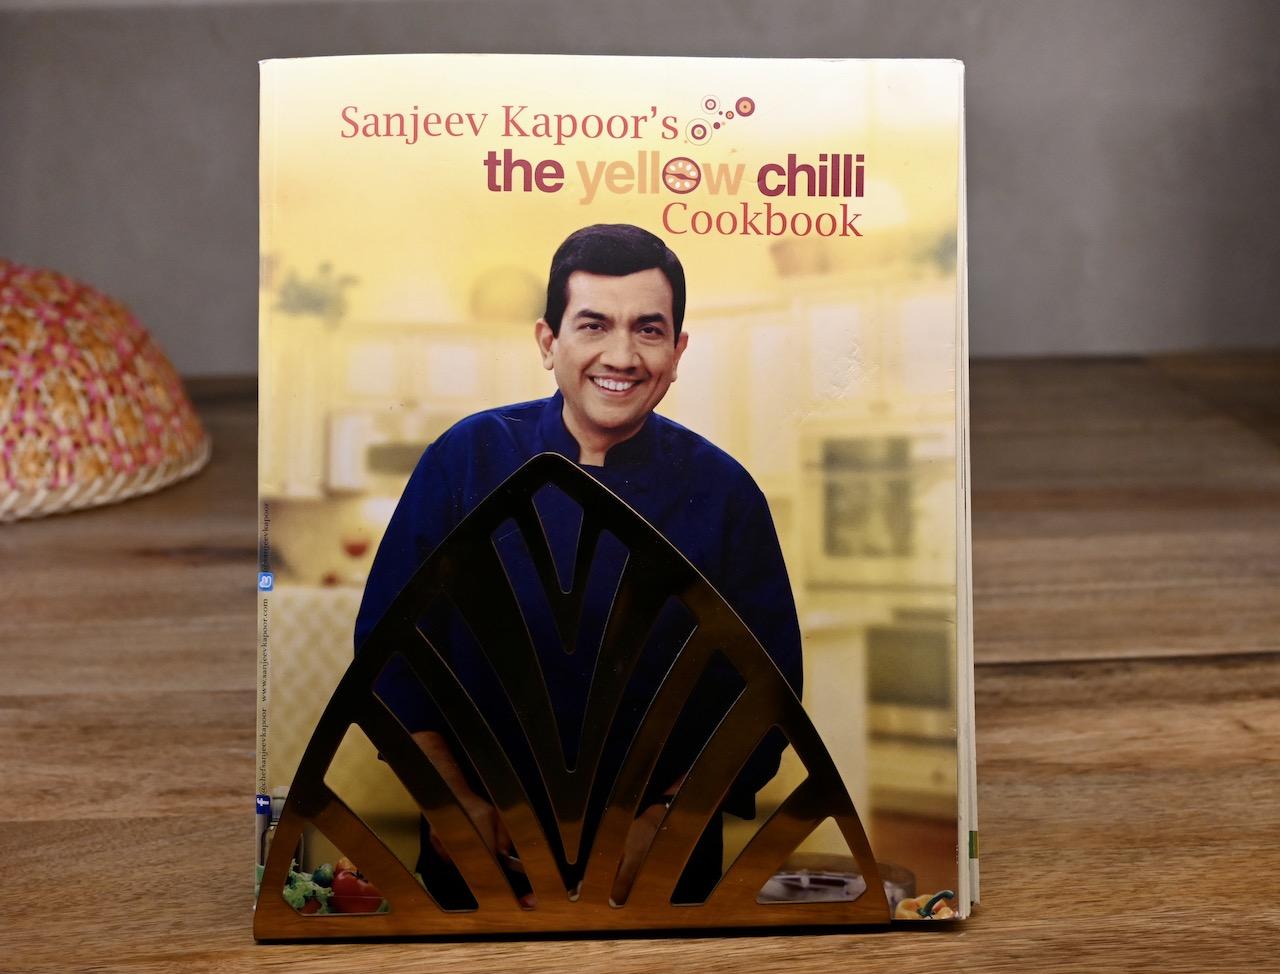 Sanjeev Kapoor - The Yellow Chilli